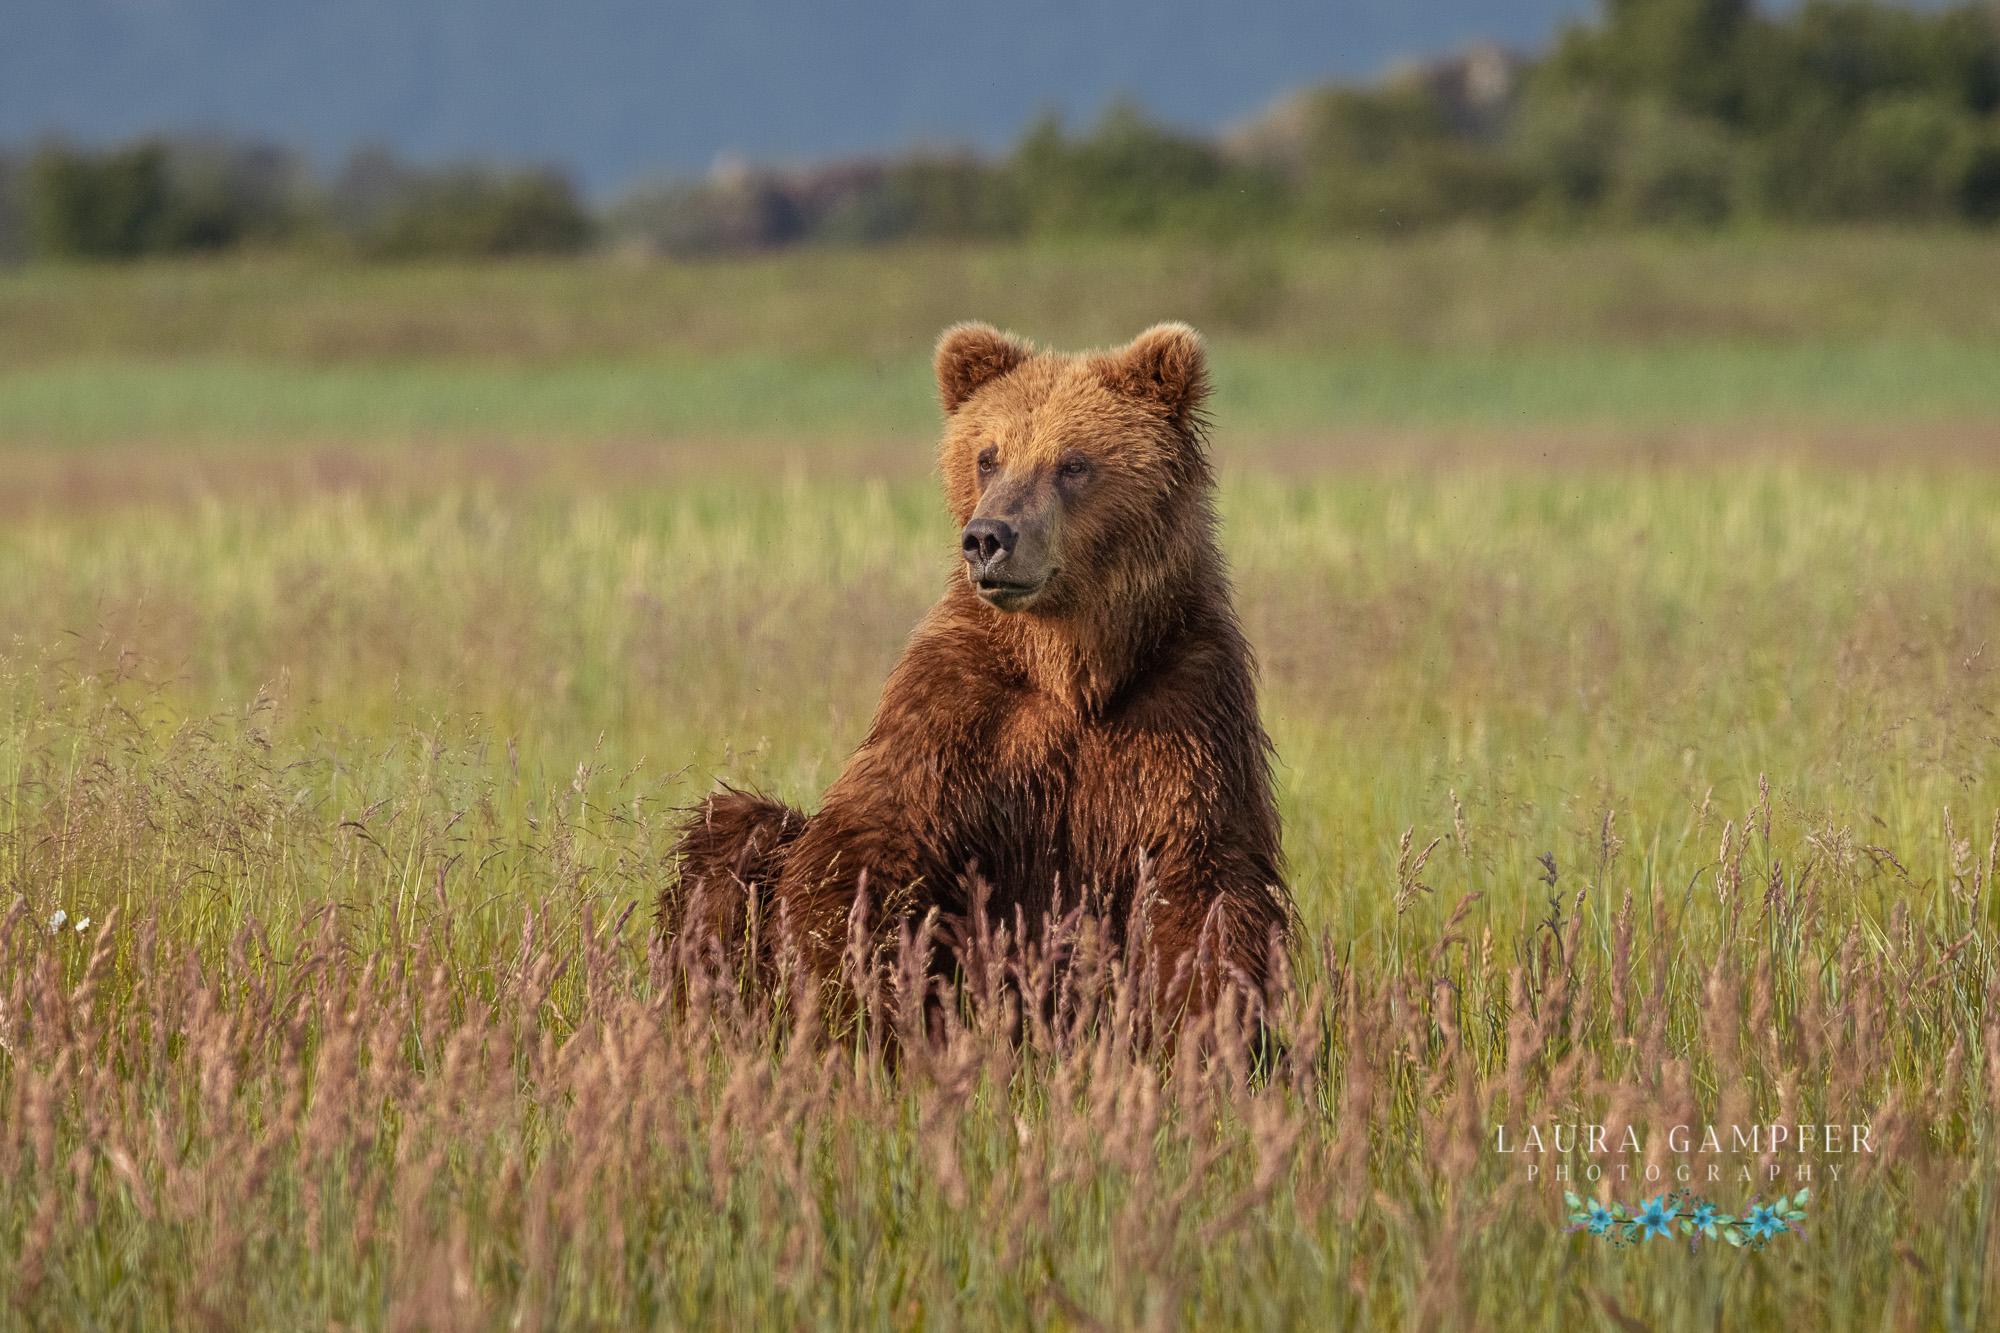 alaska grizzly bear photography